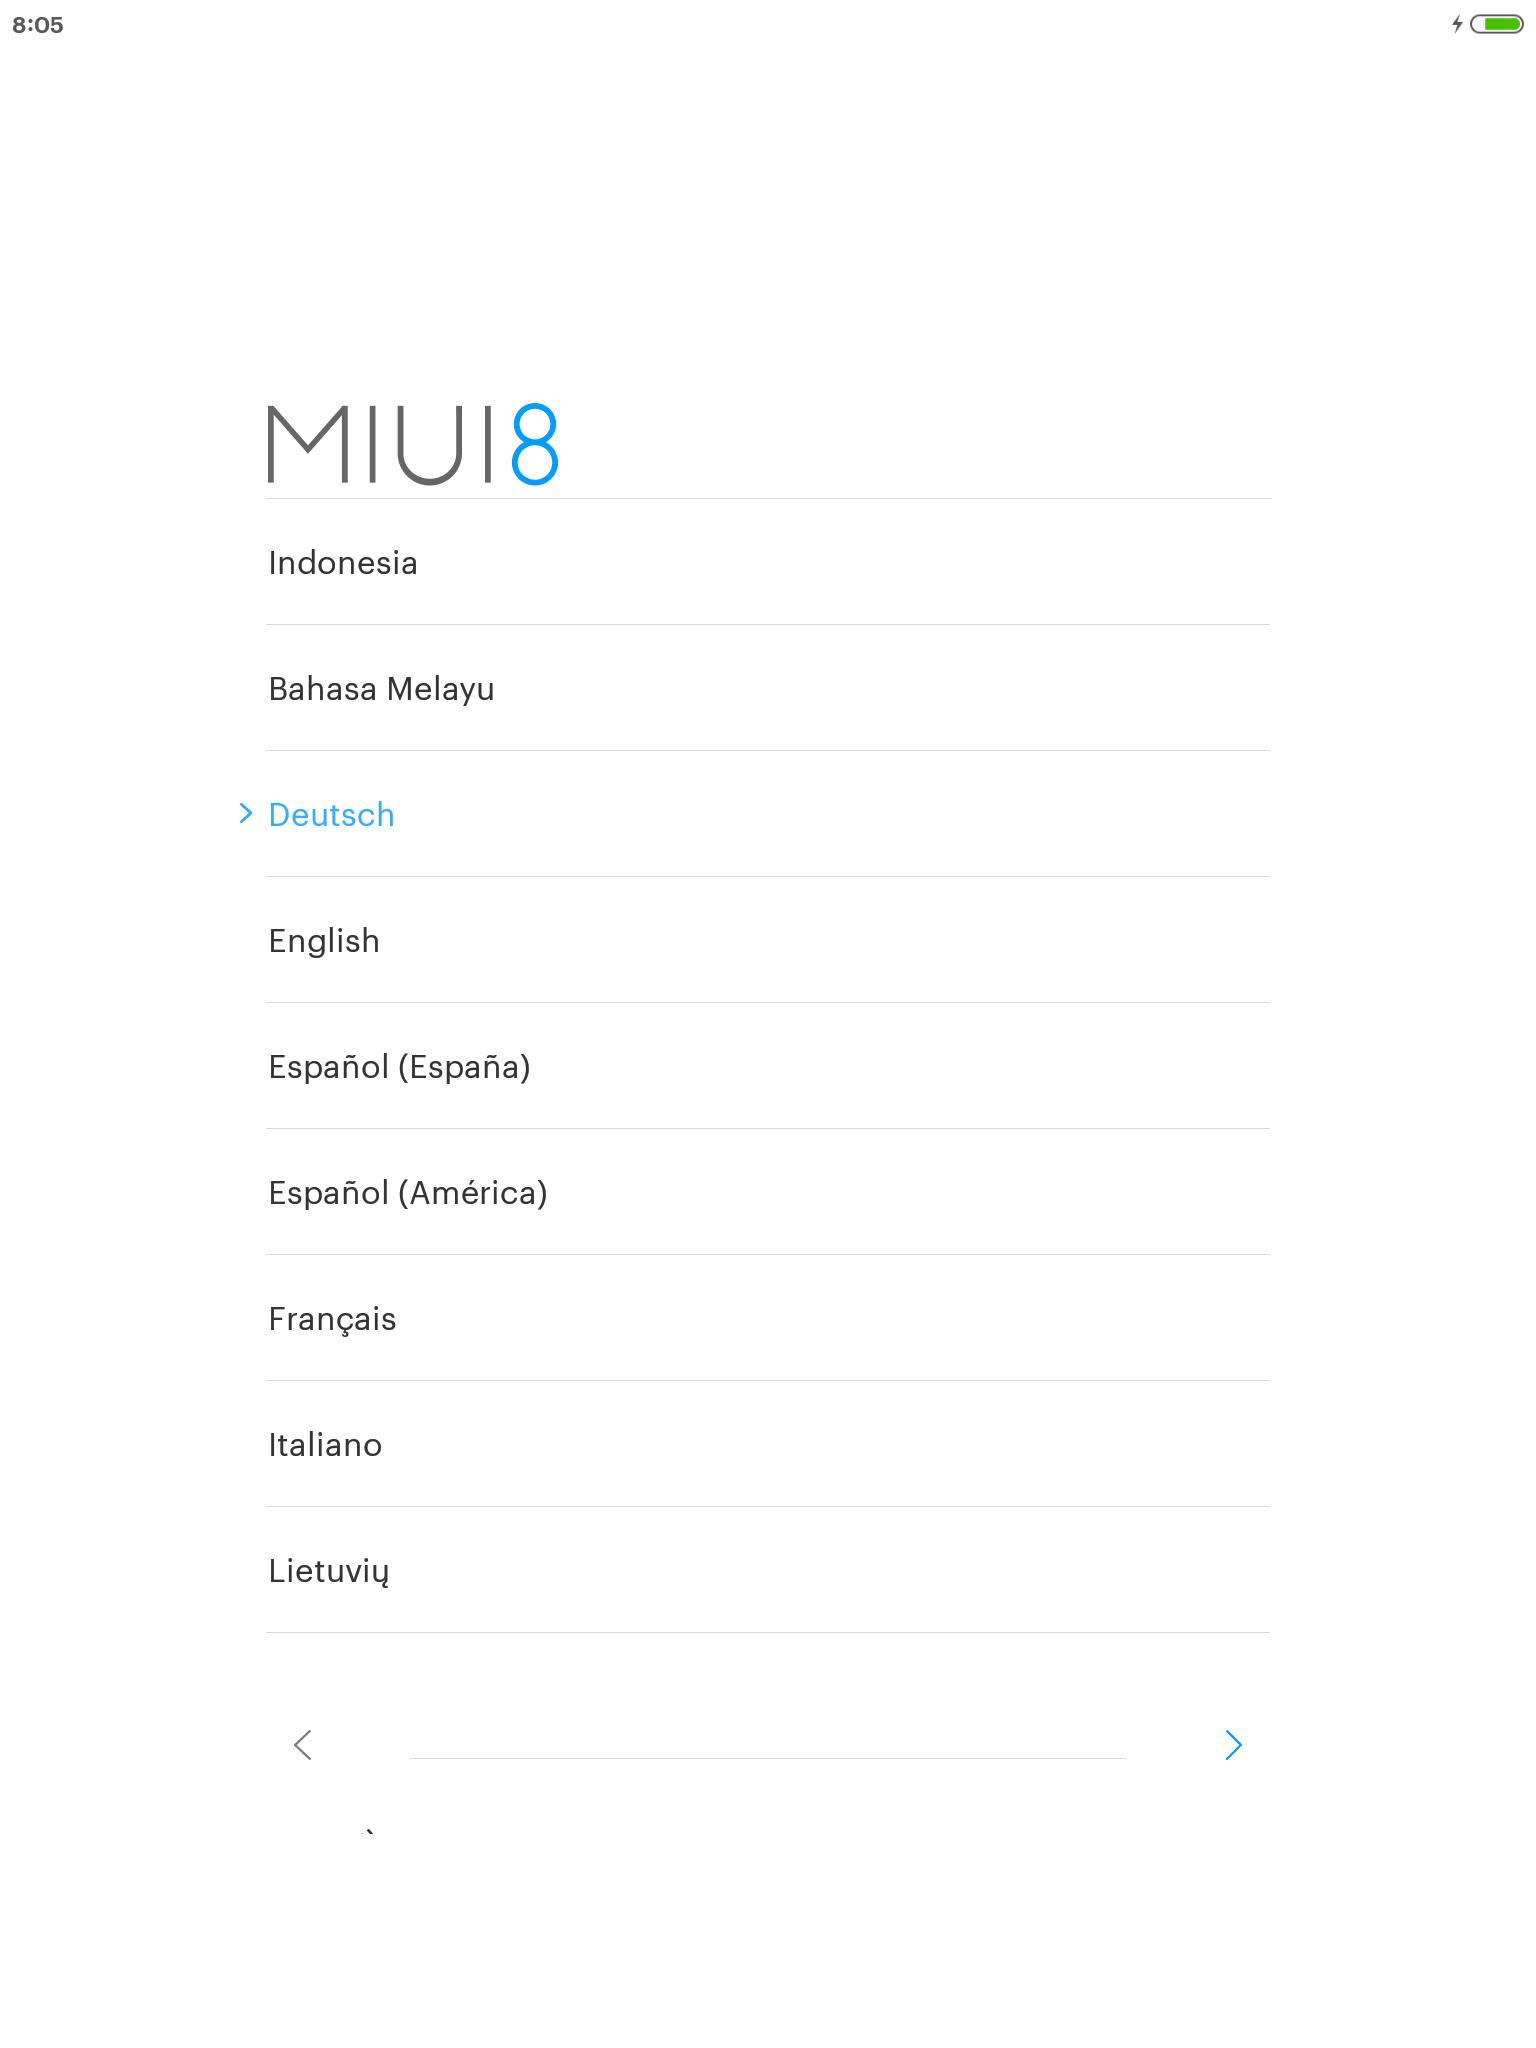 Xiaomi Mi Pad 3 Test – das ideale Tablet für Couch-Potatoes 9 techboys.de • smarte News, auf den Punkt! Xiaomi Mi Pad 3 Test – das ideale Tablet für Couch-Potatoes